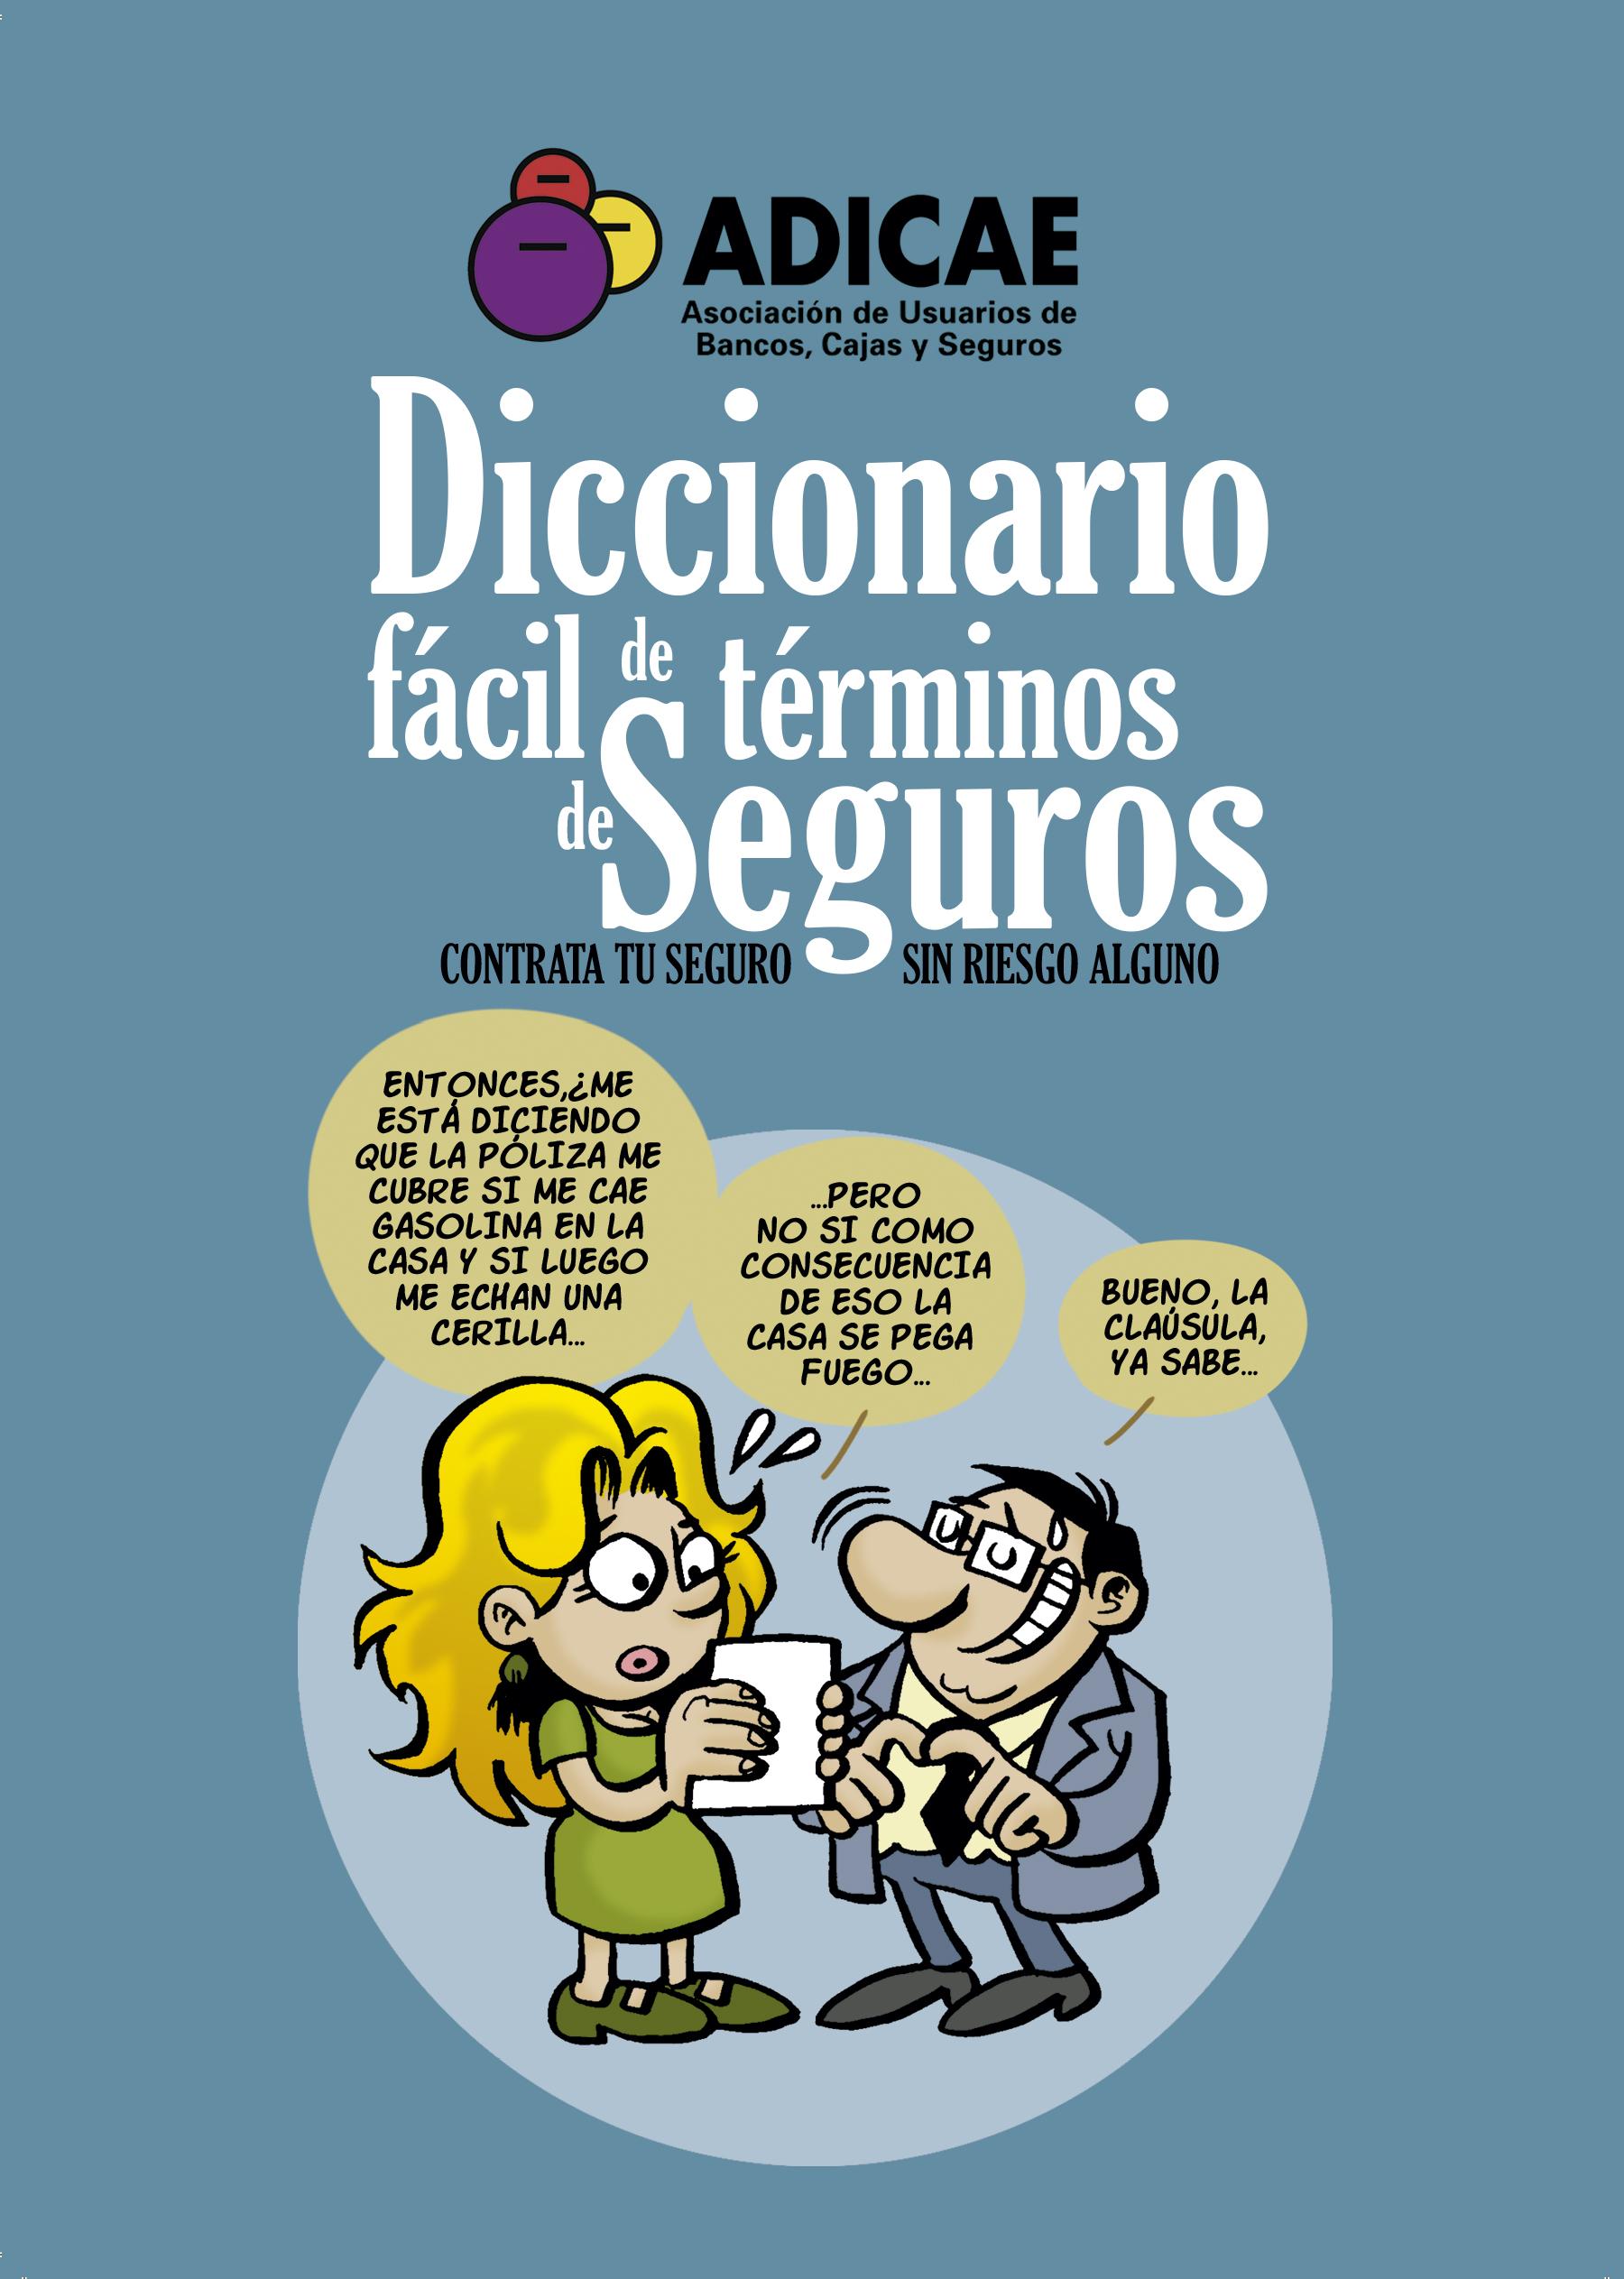 http://publicaciones.adicae.net/publicaciones/descarga.php?art=983